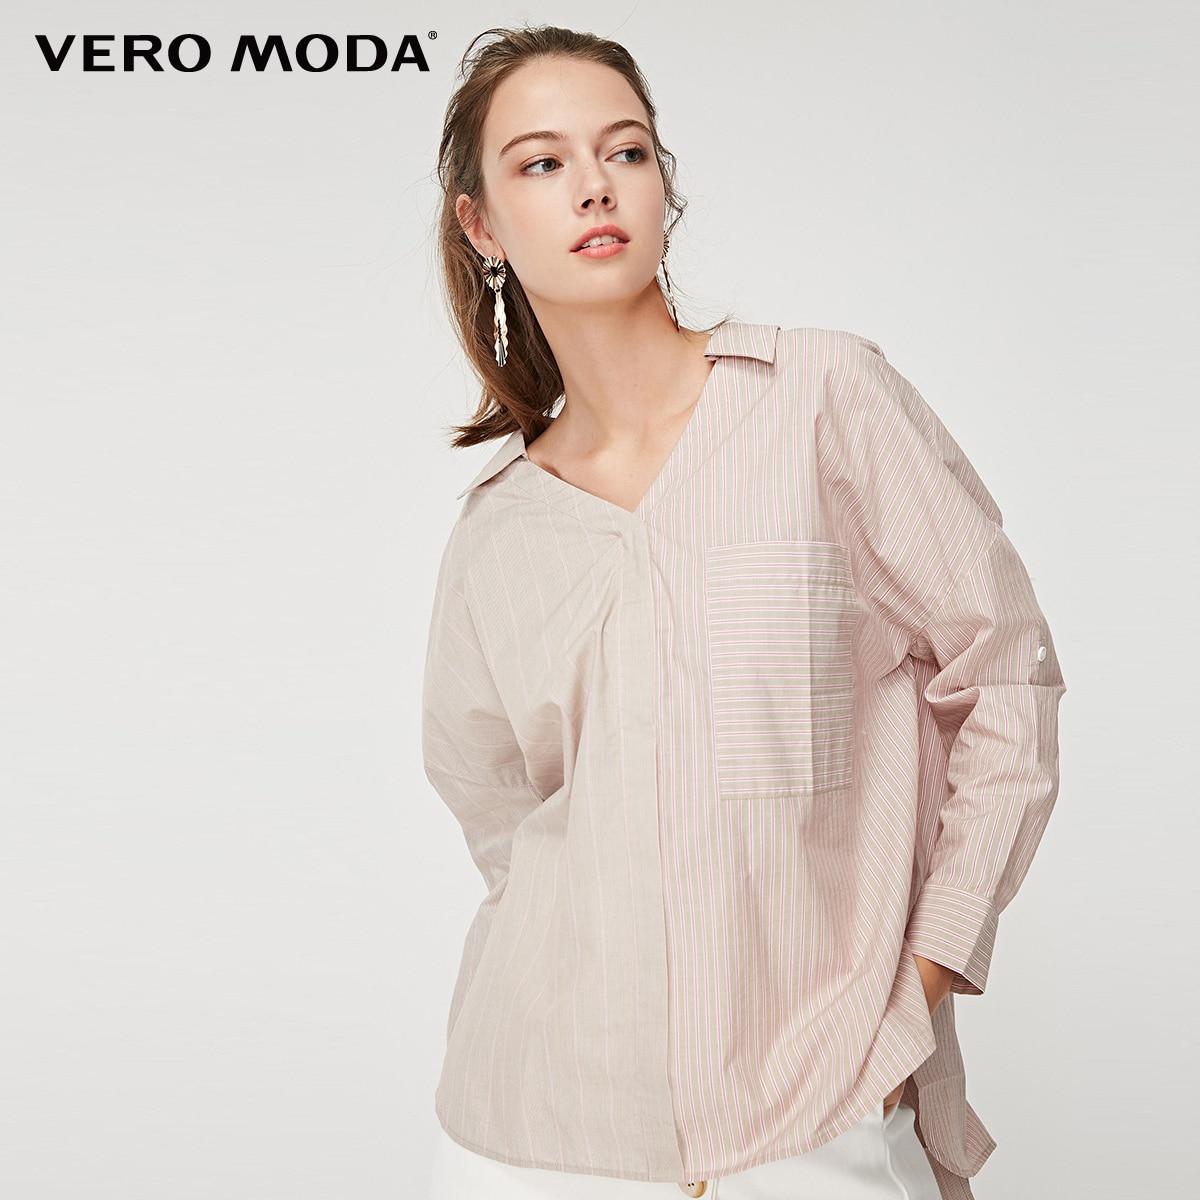 Vero Moda Women's 100% Cotton Striped Loose Fit Drop-shoulder Sleeves Shirt | 319151515